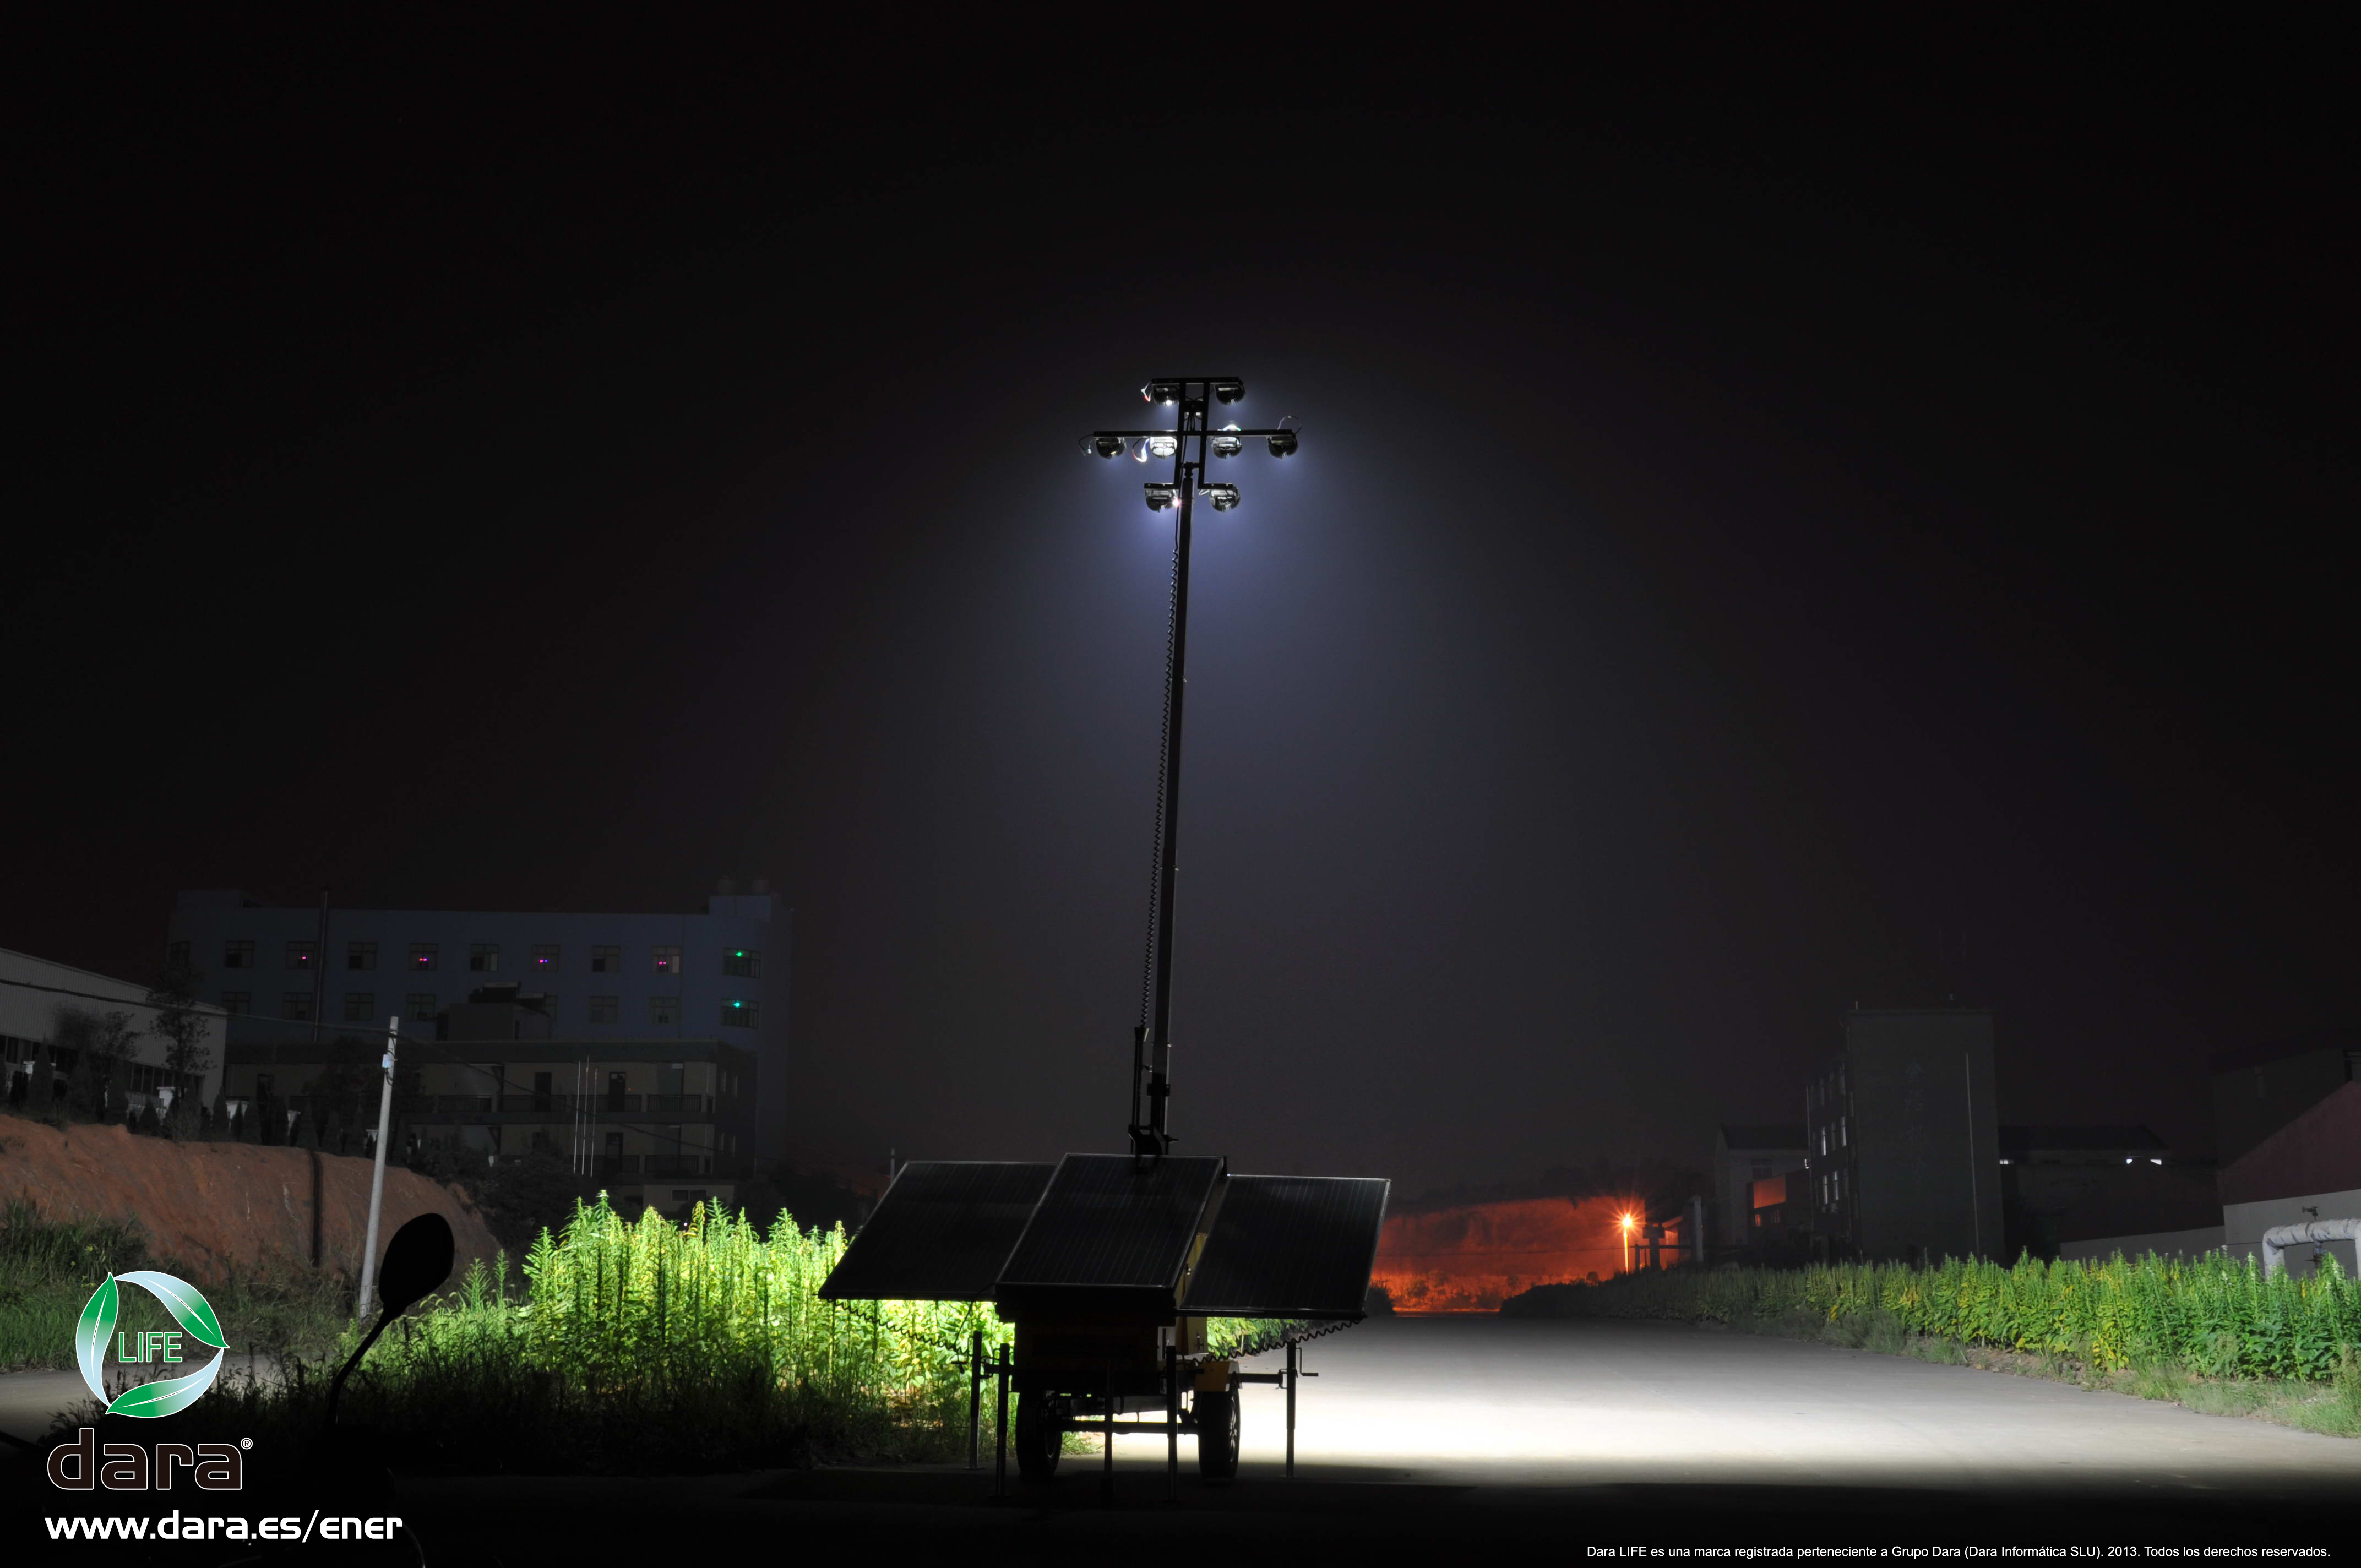 Dara life greenlight torre de iluminaci n solar m vil - Lamparas led solares ...